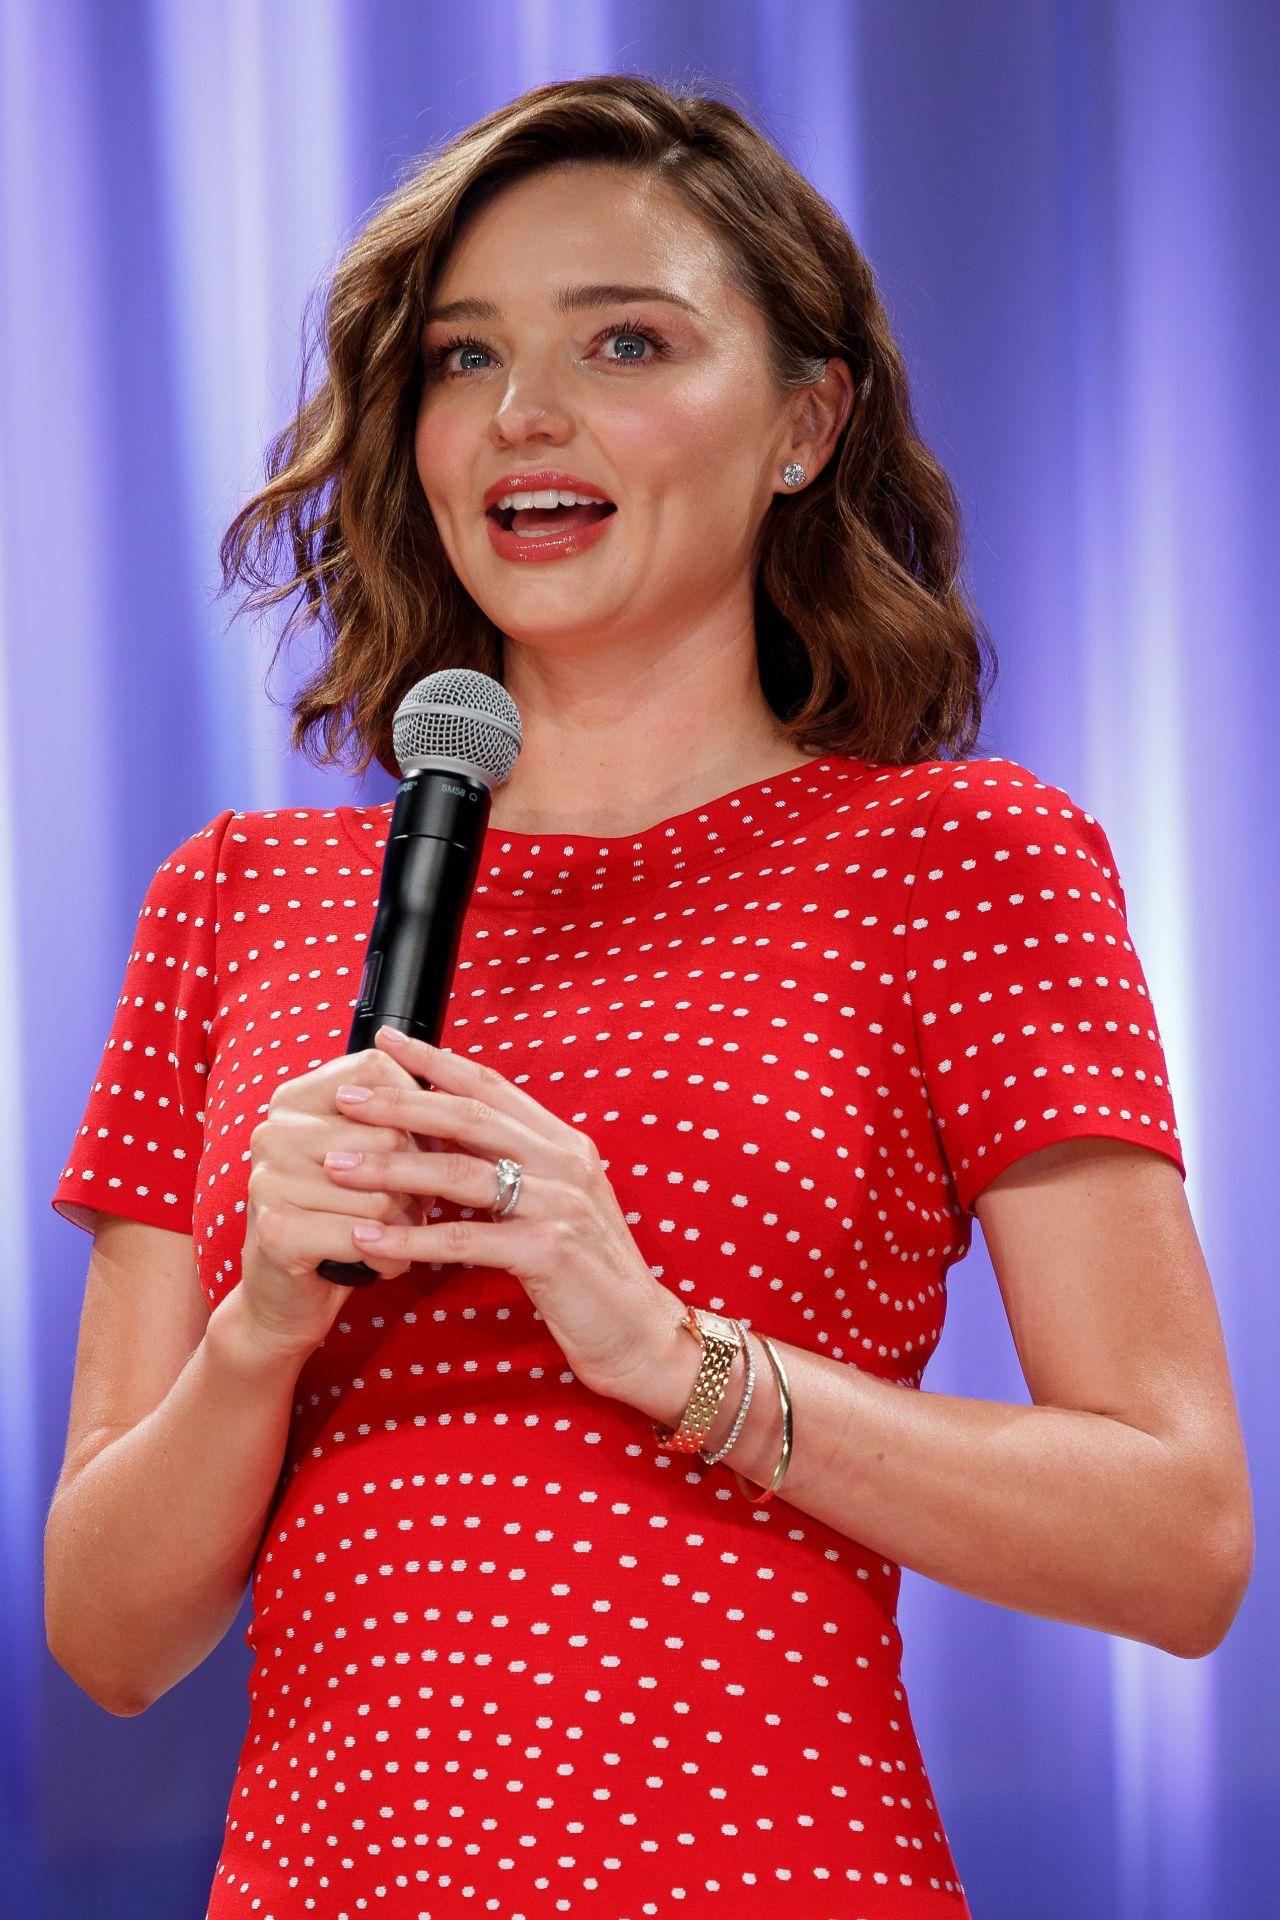 Miranda Kerr - Promotes Marukome Products in Tokyo, Japan ... Miranda Kerr